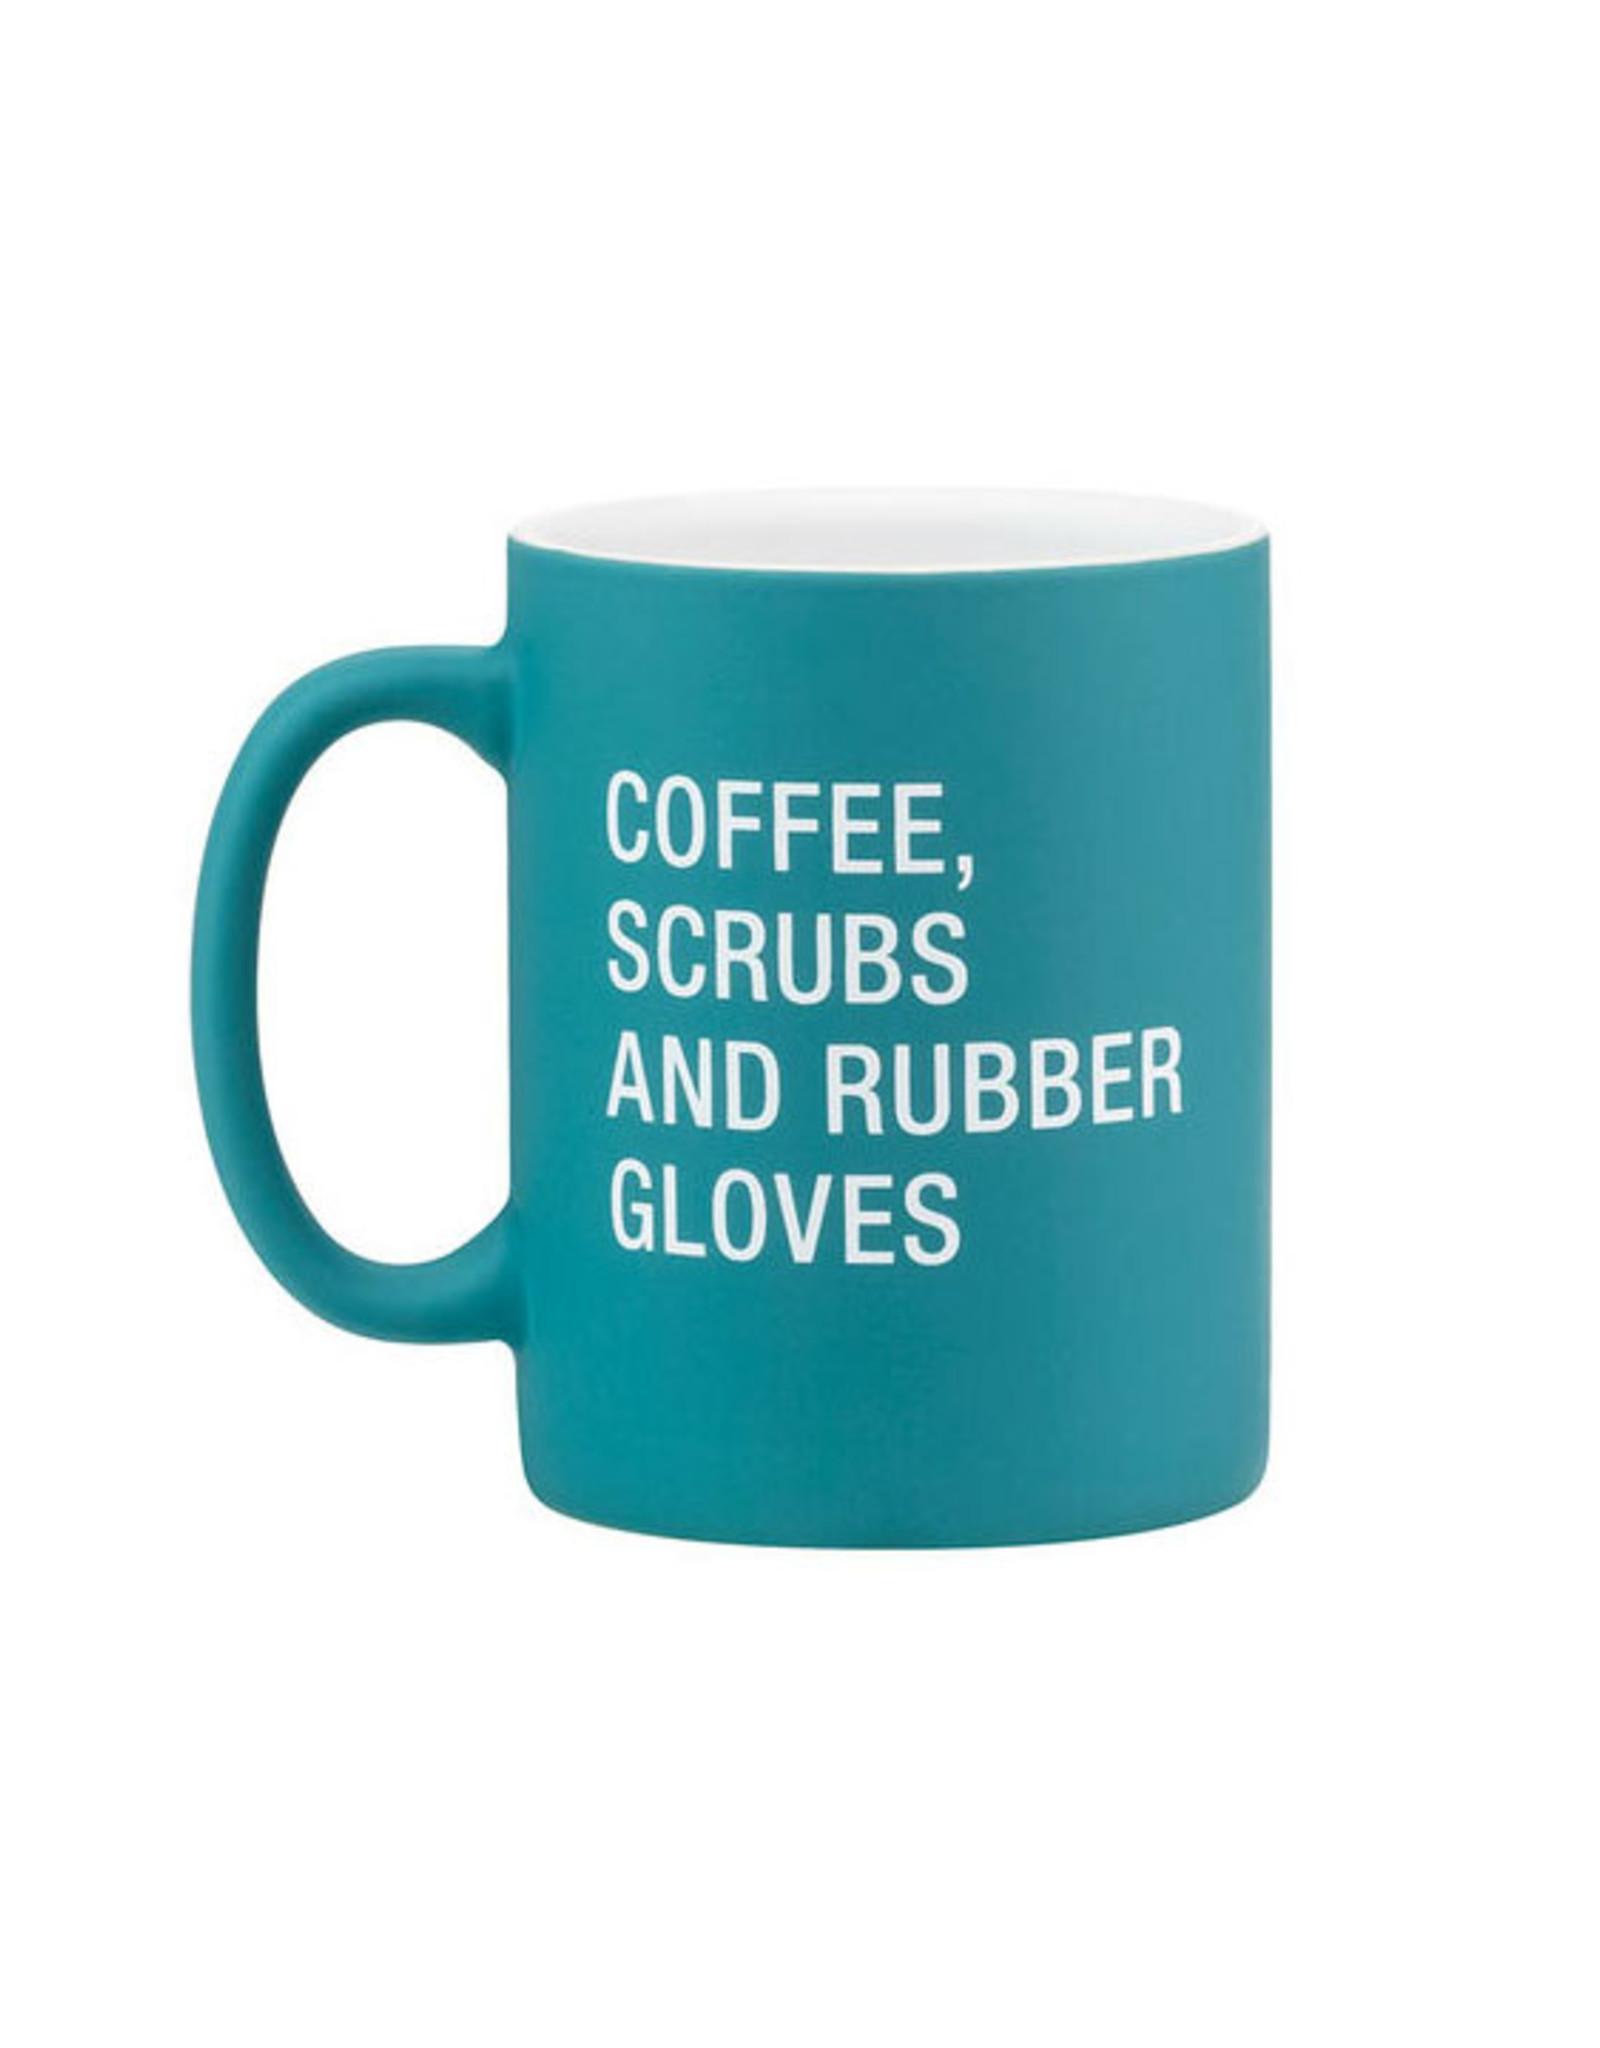 Coffee, Scrubs, Rubber Gloves Mug